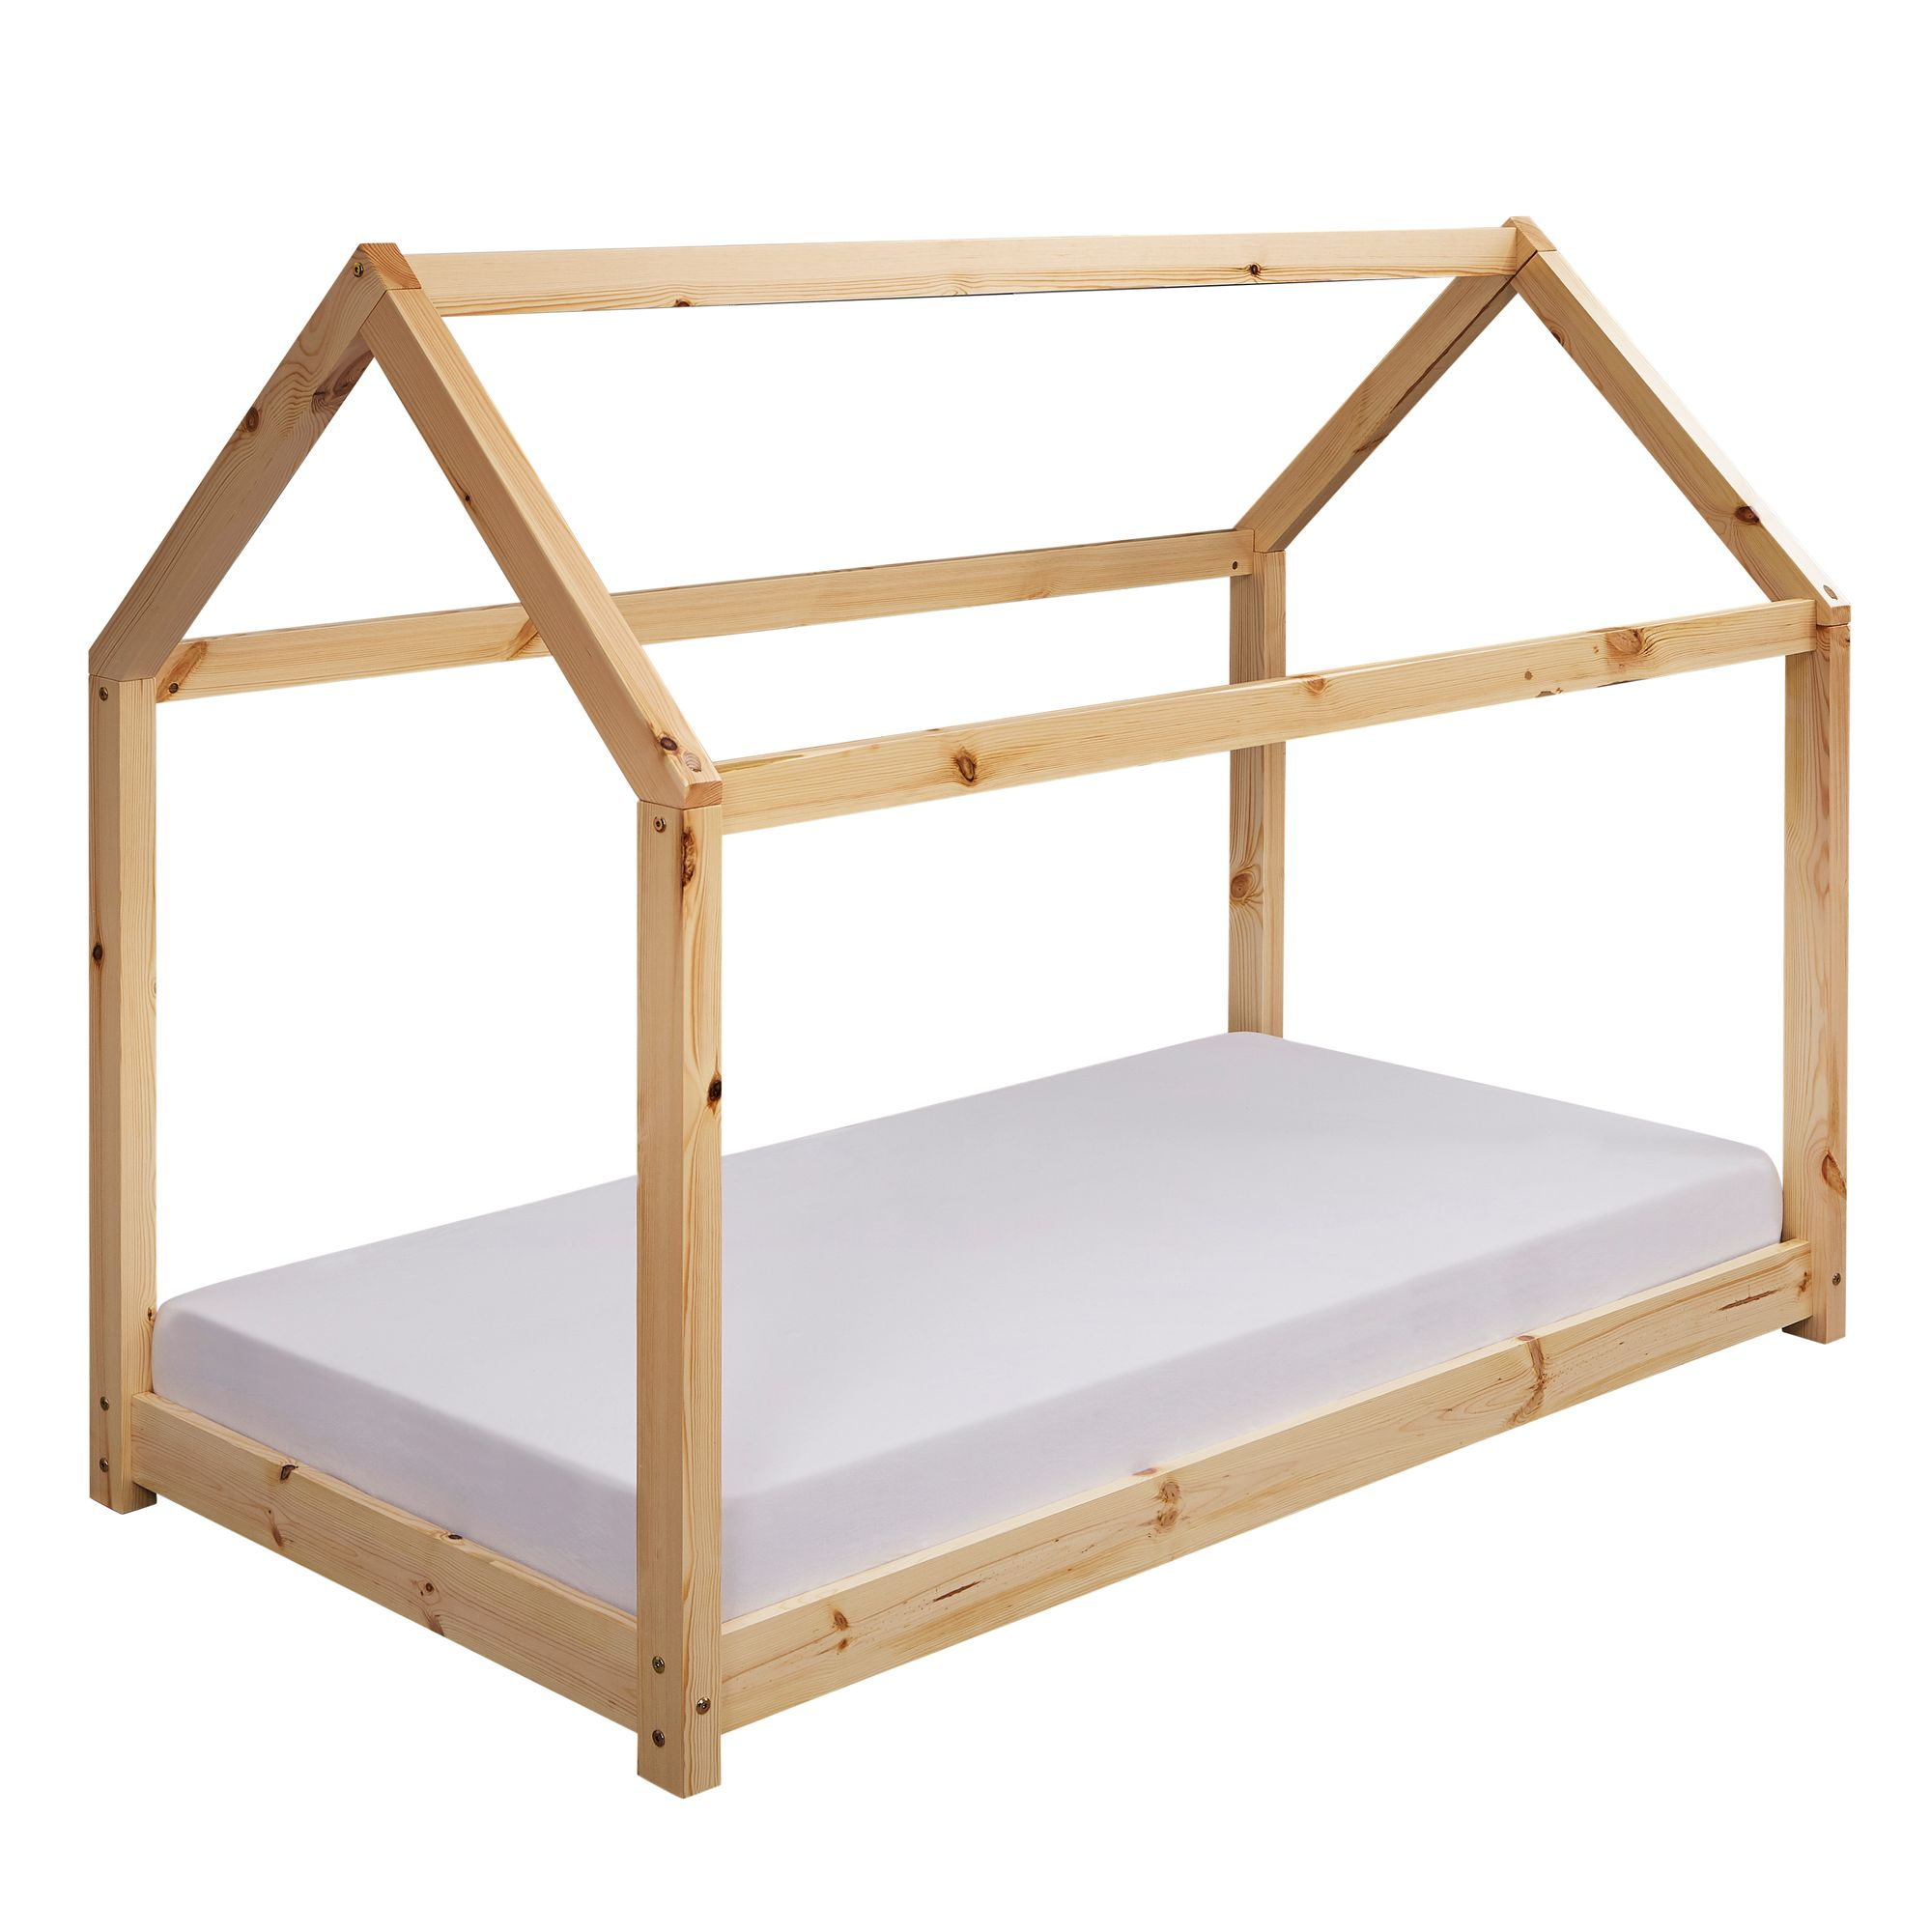 FineBuy Kinderbett Haus Kiefer Holz Bett Kinder Schlafbett Hausbett  Lattenrost